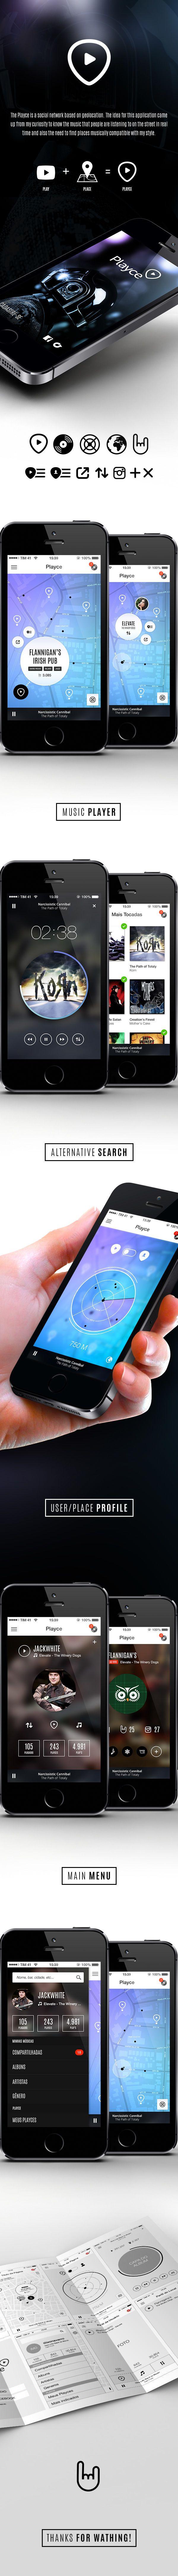 Playce - App Design